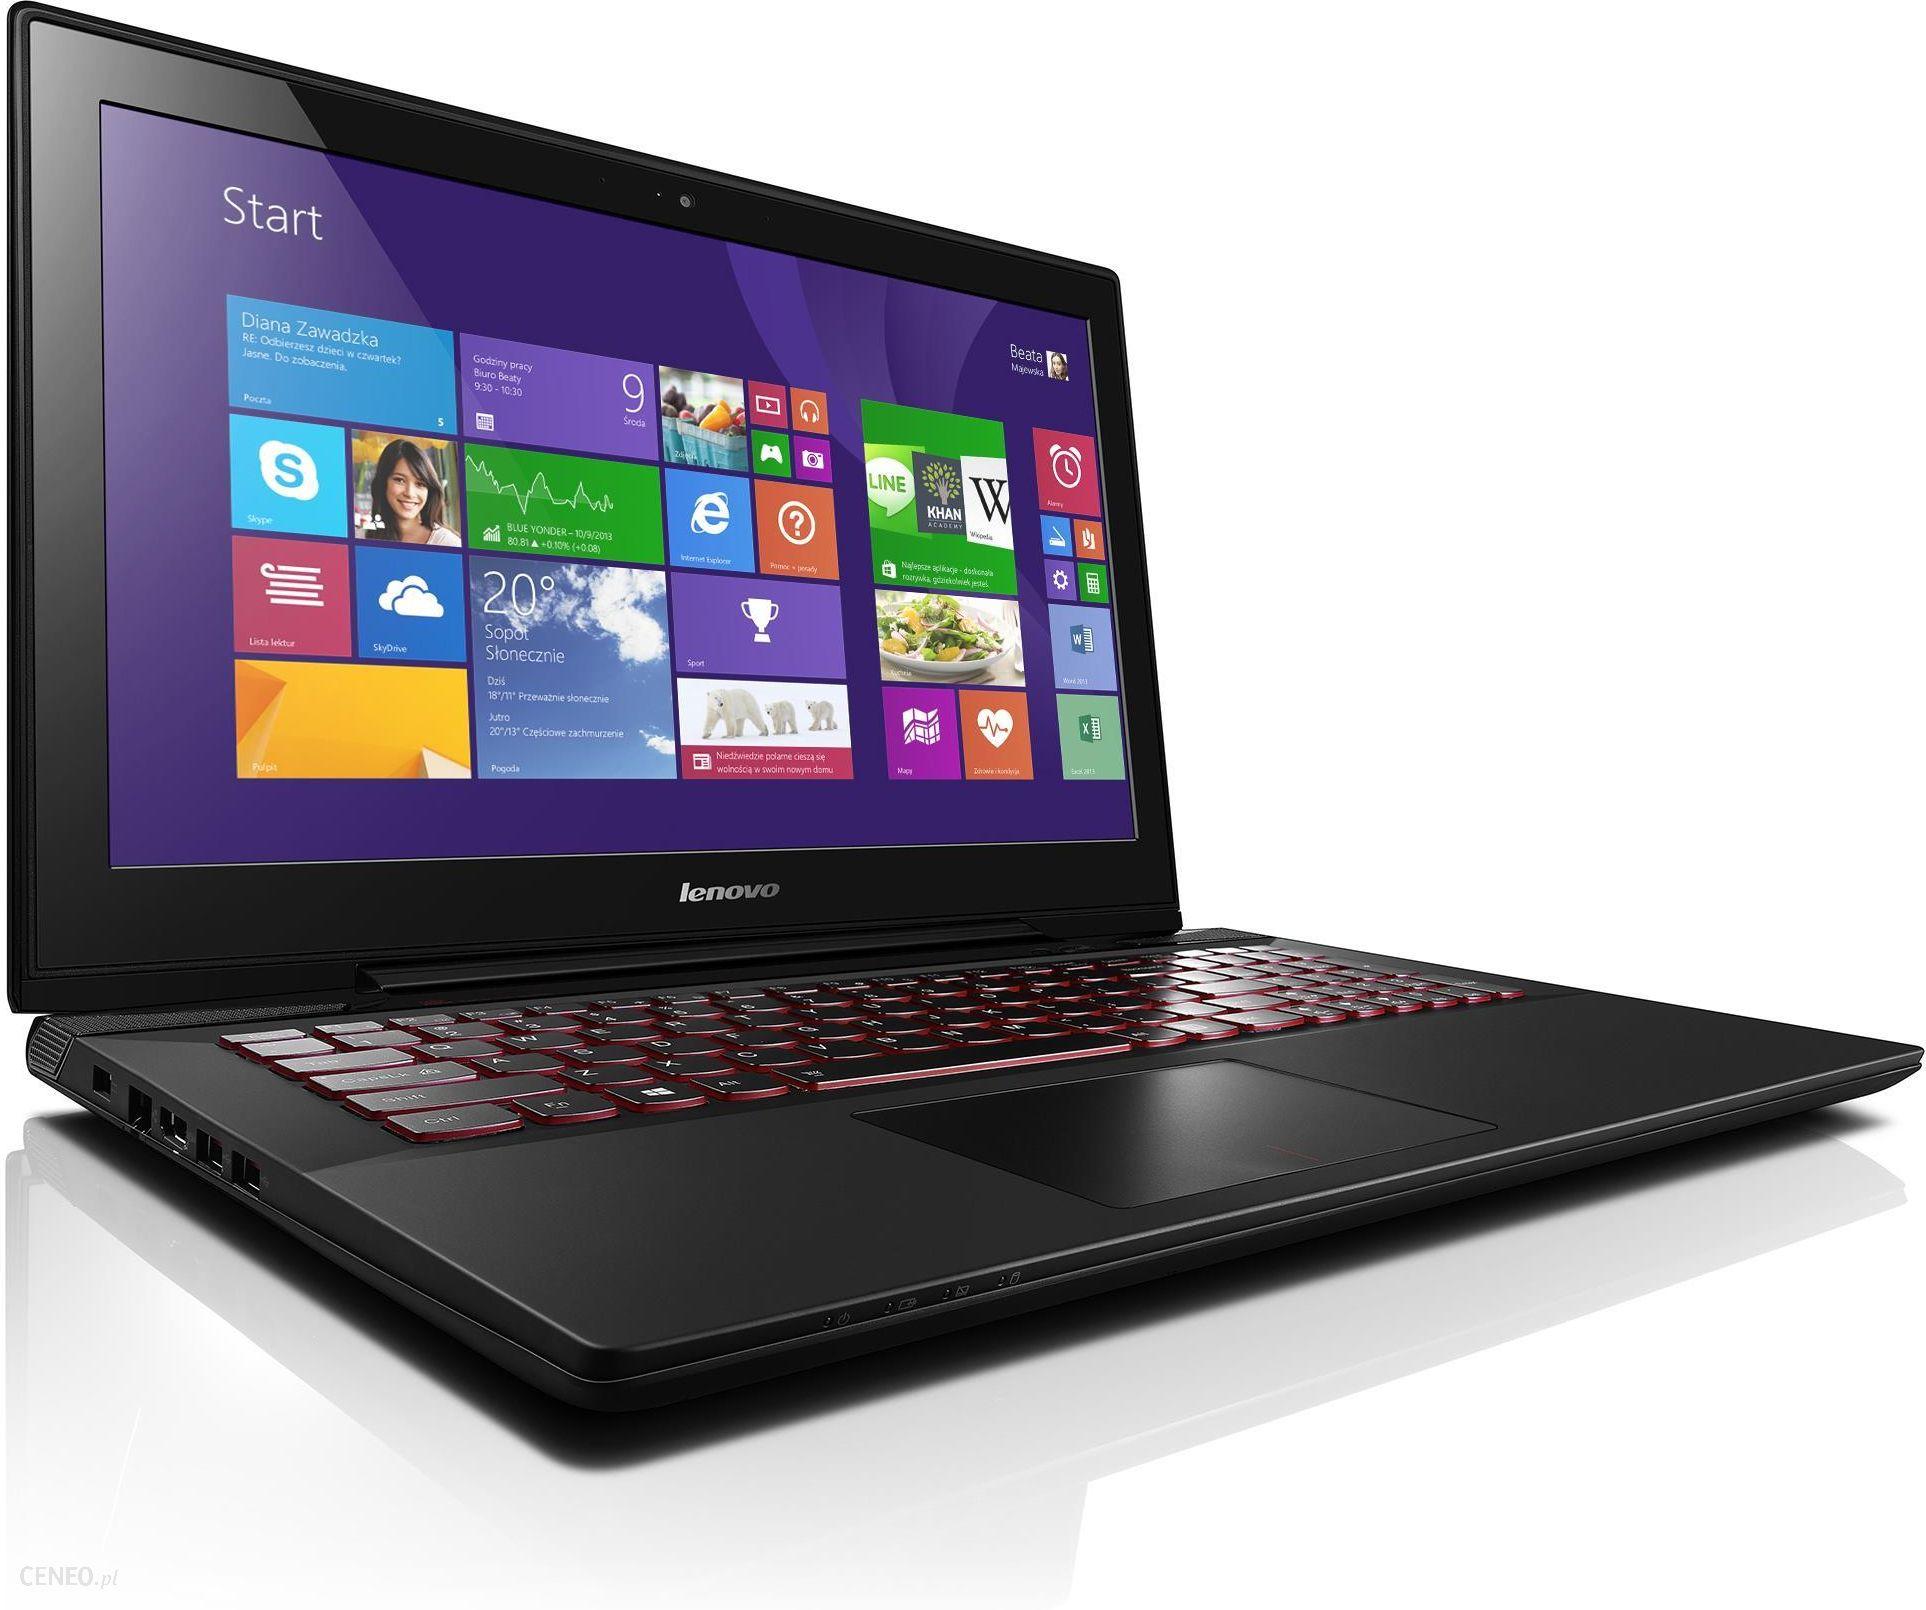 Laptop Lenovo Y50 70 59 zdjęcie 1